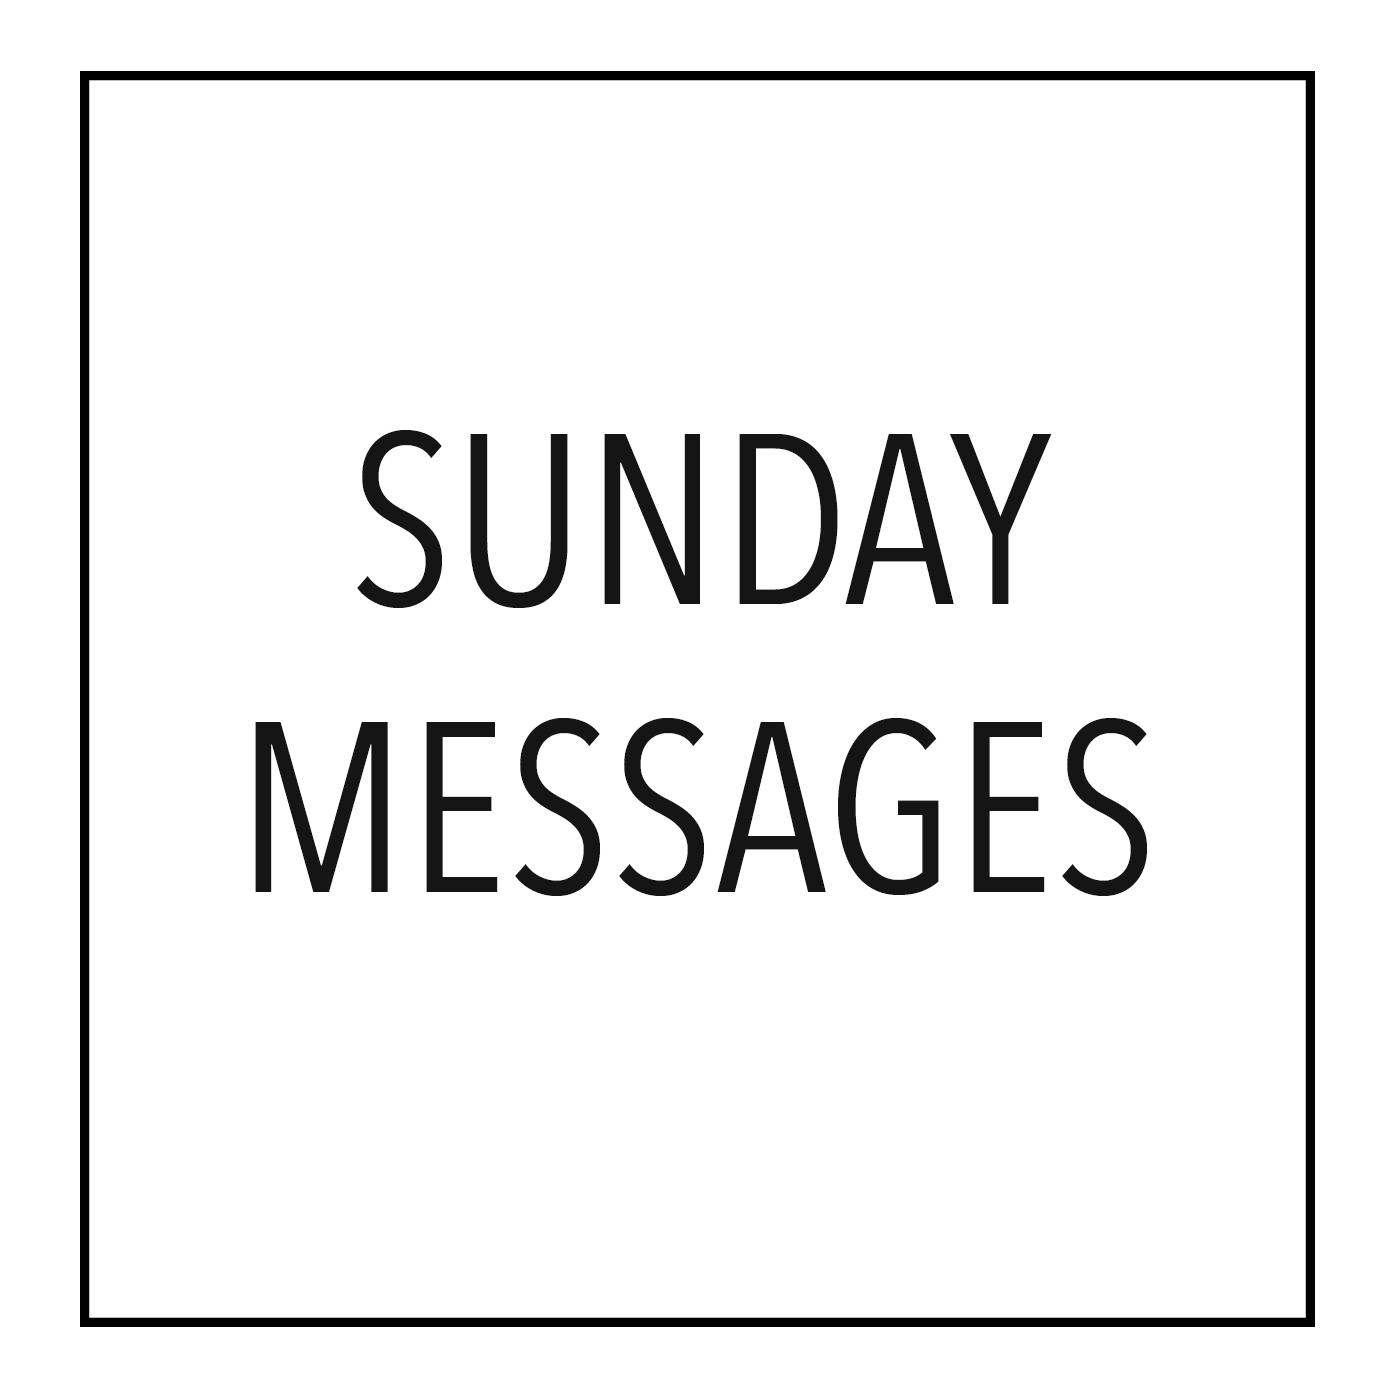 sunday messages.jpg